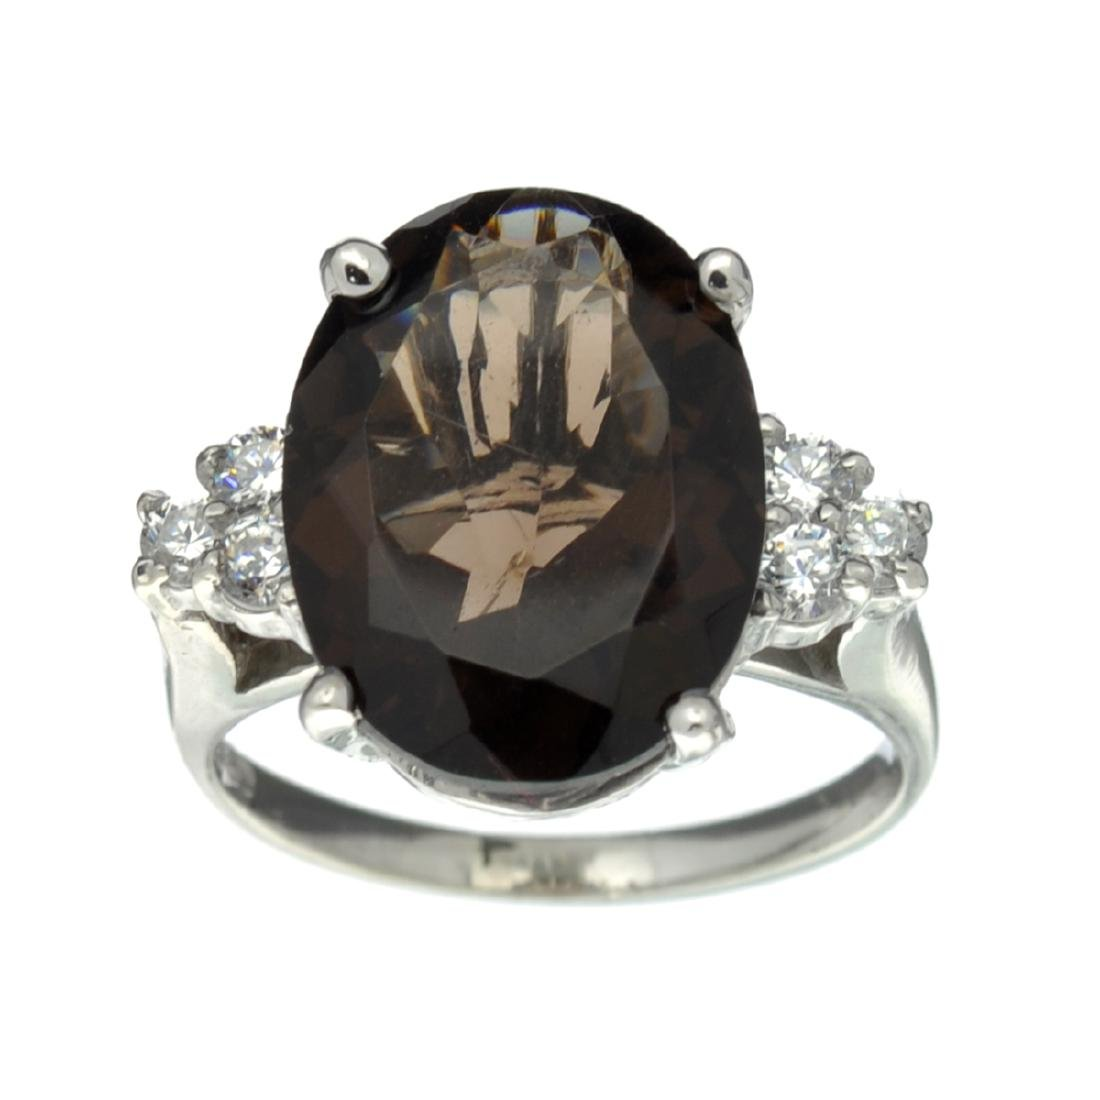 APP: 0.7k Fine Jewelry Designer Sebastian, 7.93CT Smoky